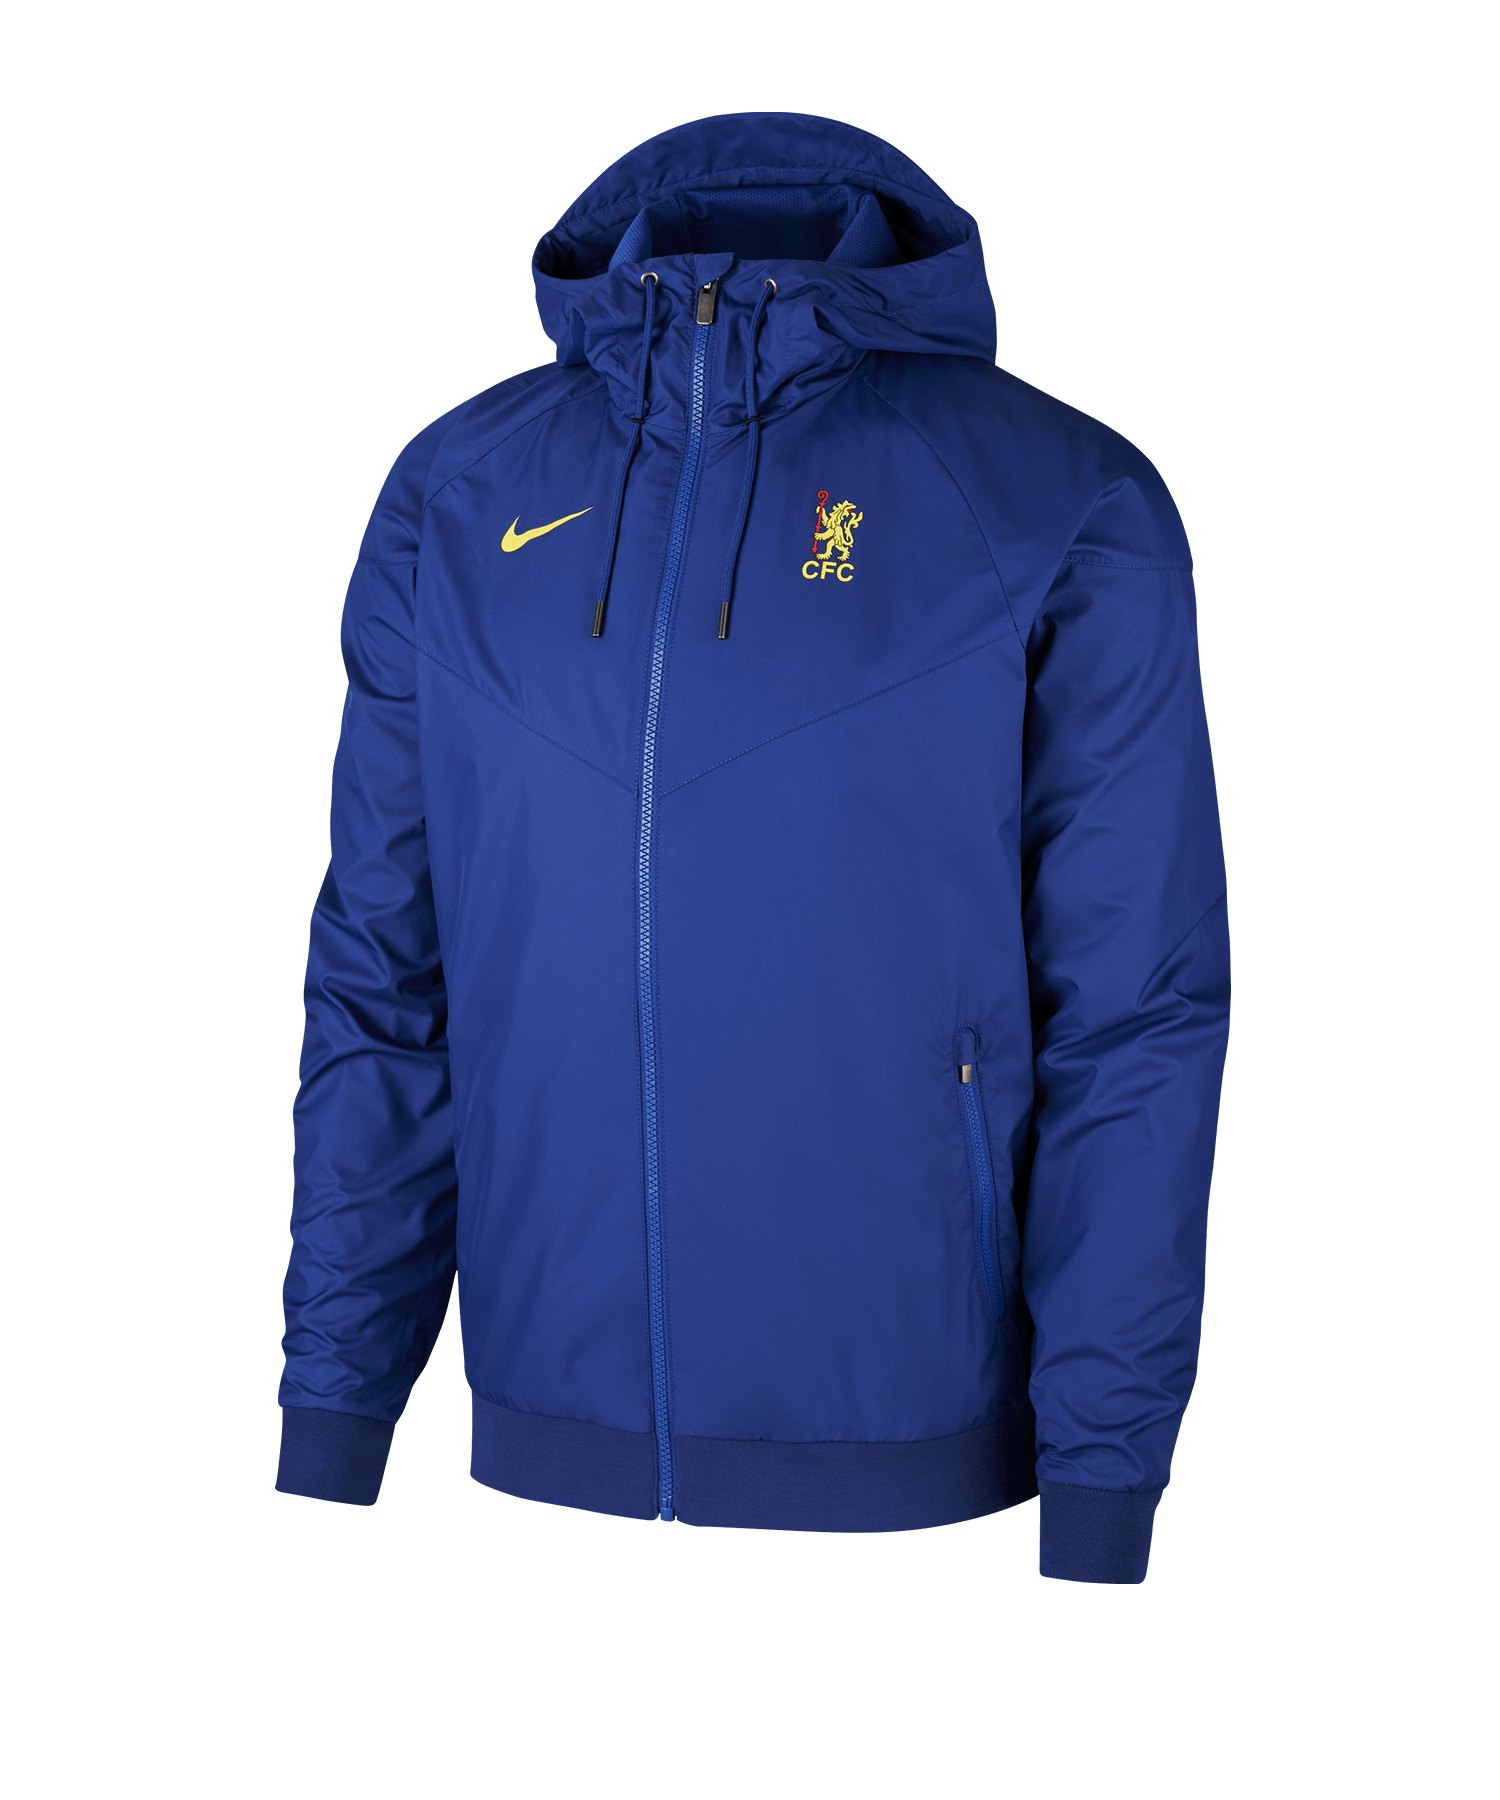 Nike FC Chelsea Windrunner Jacket Blau F495 - blau